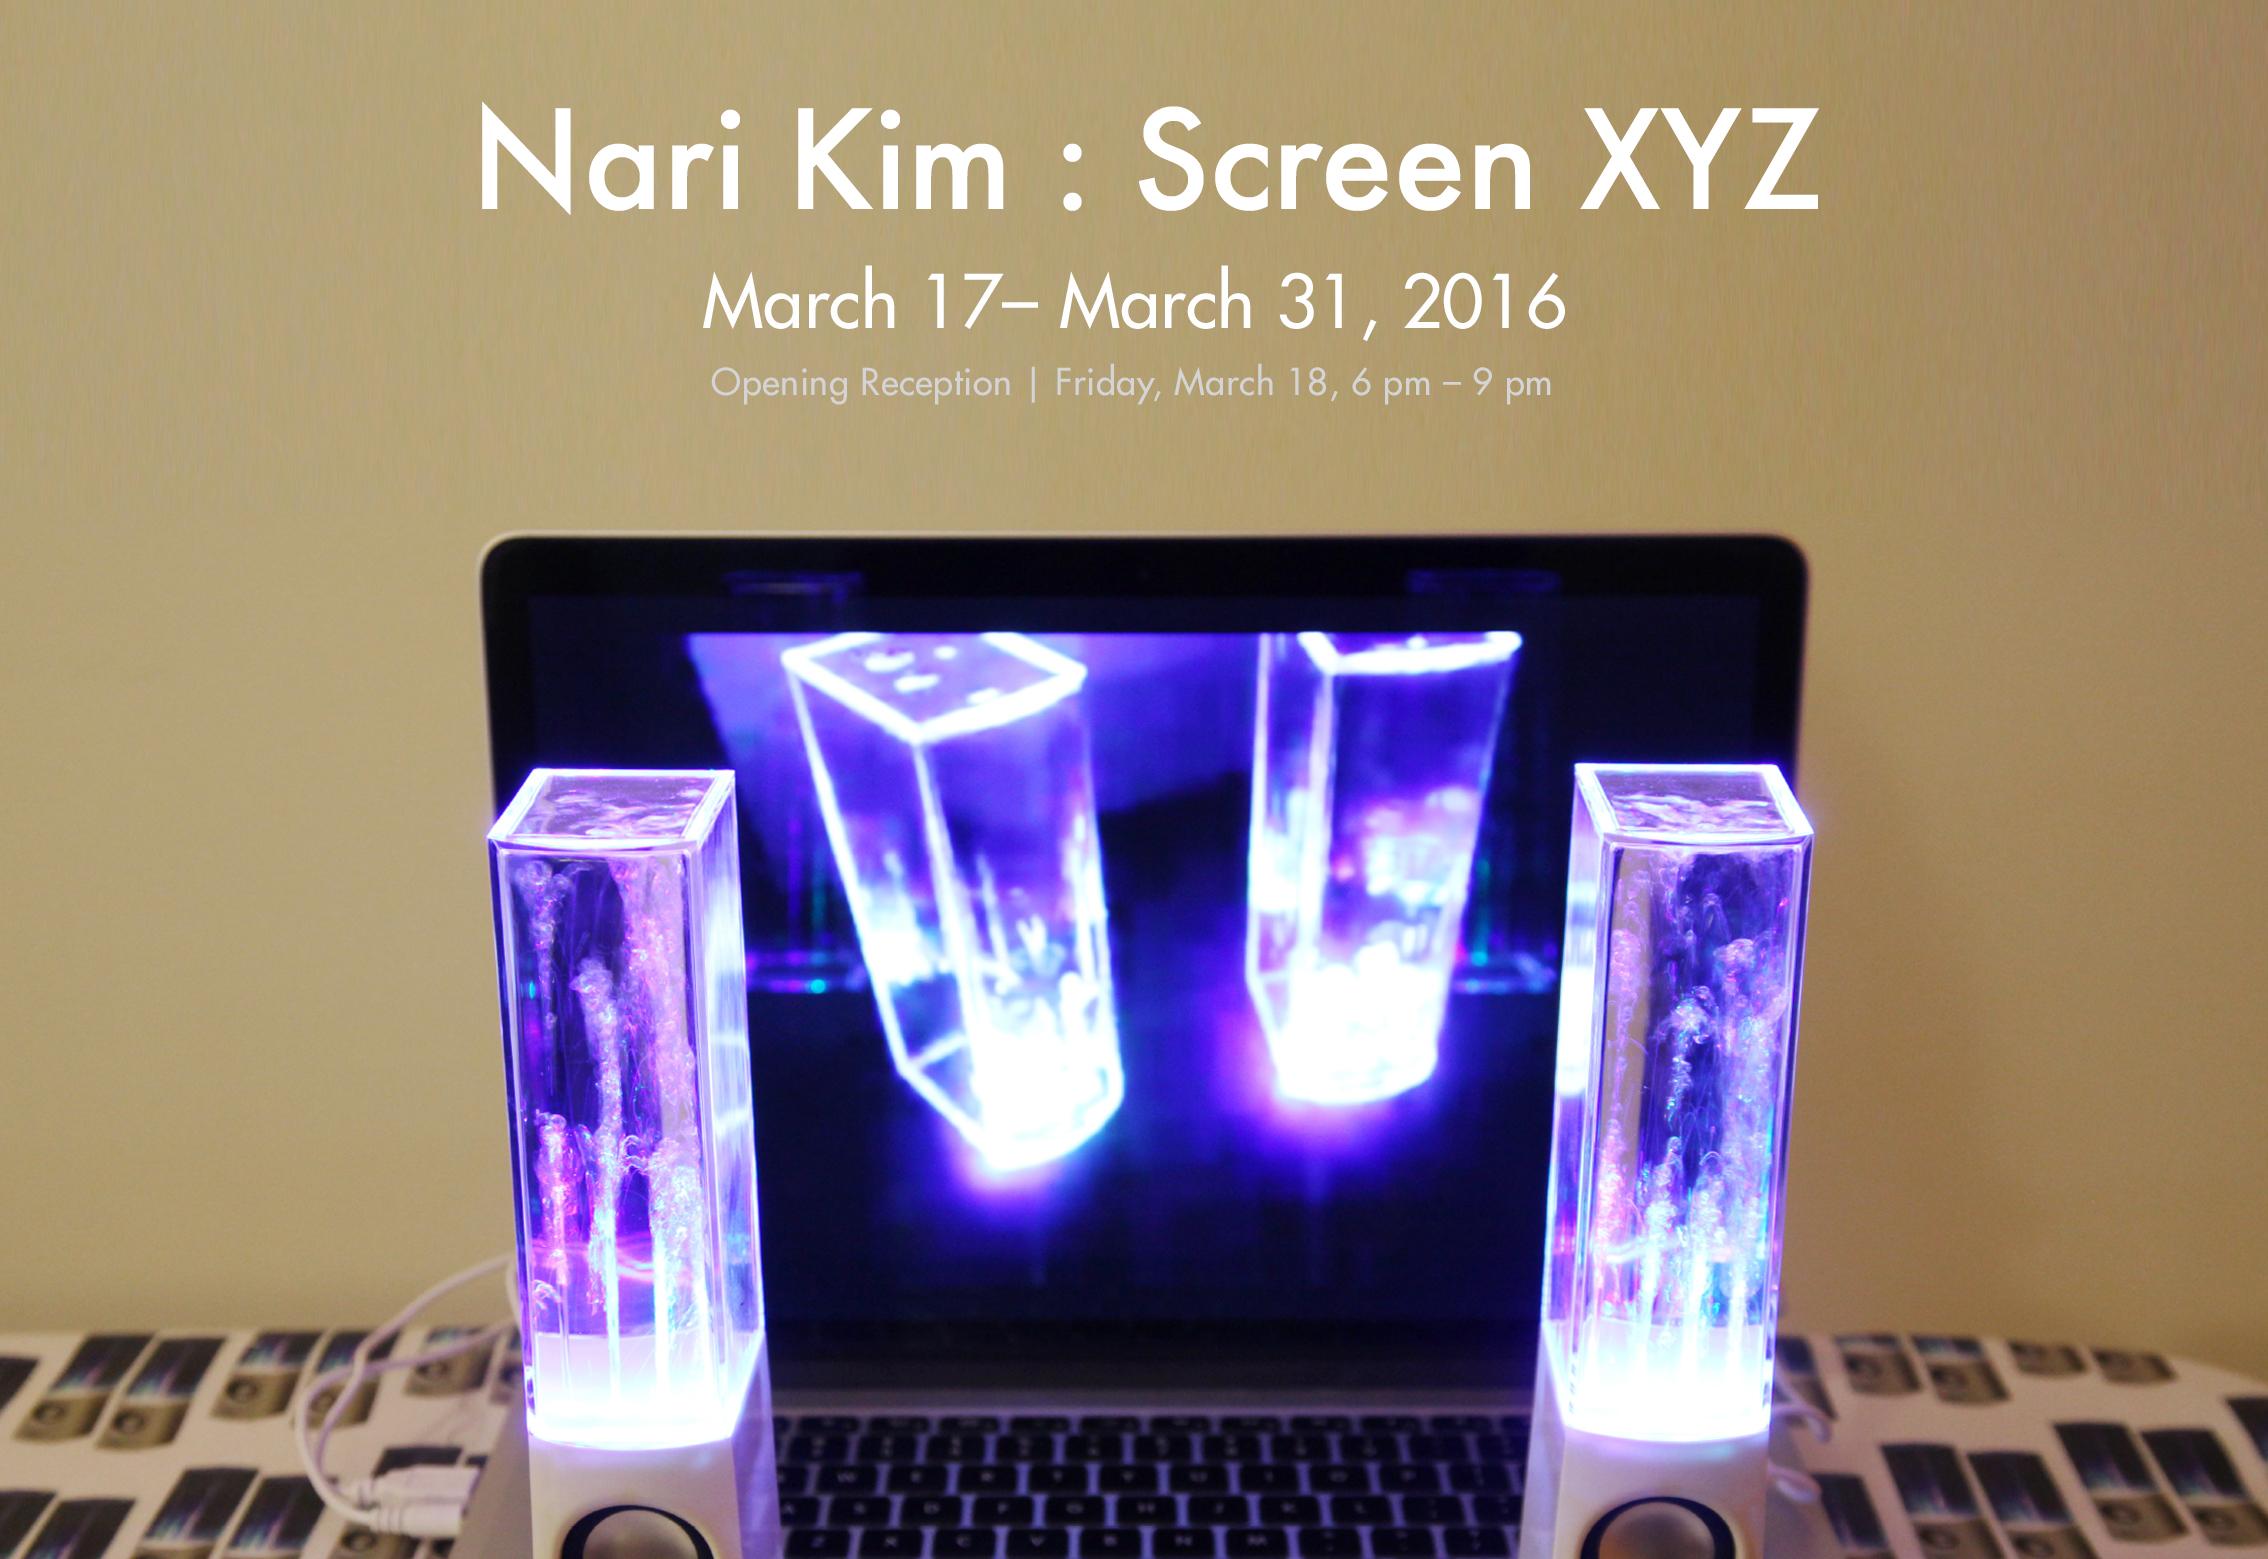 Screen XYZ Nari Kim solo